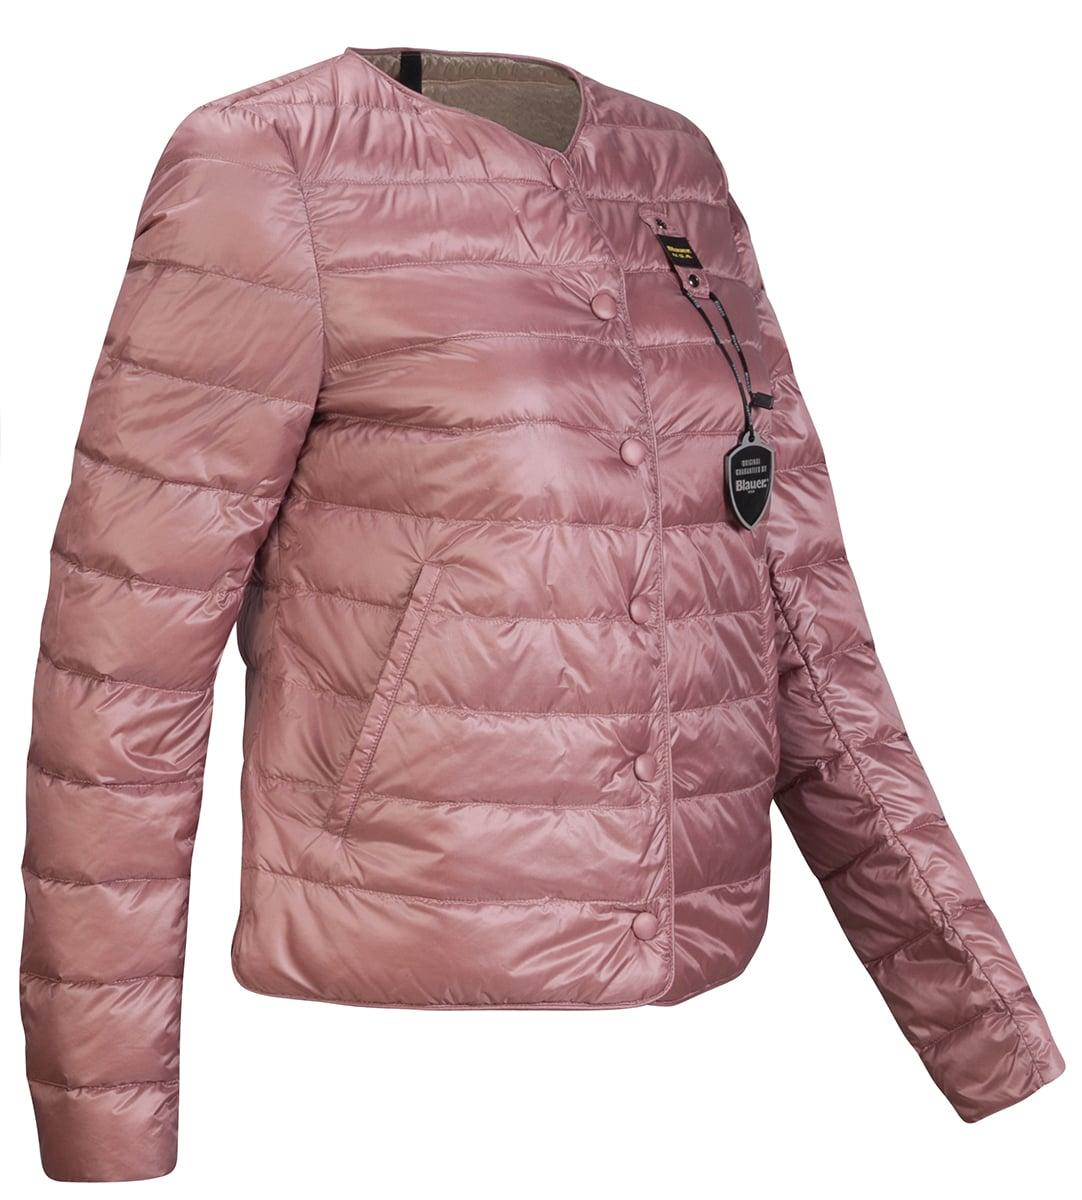 Пуховик женский Blauer USA розовый